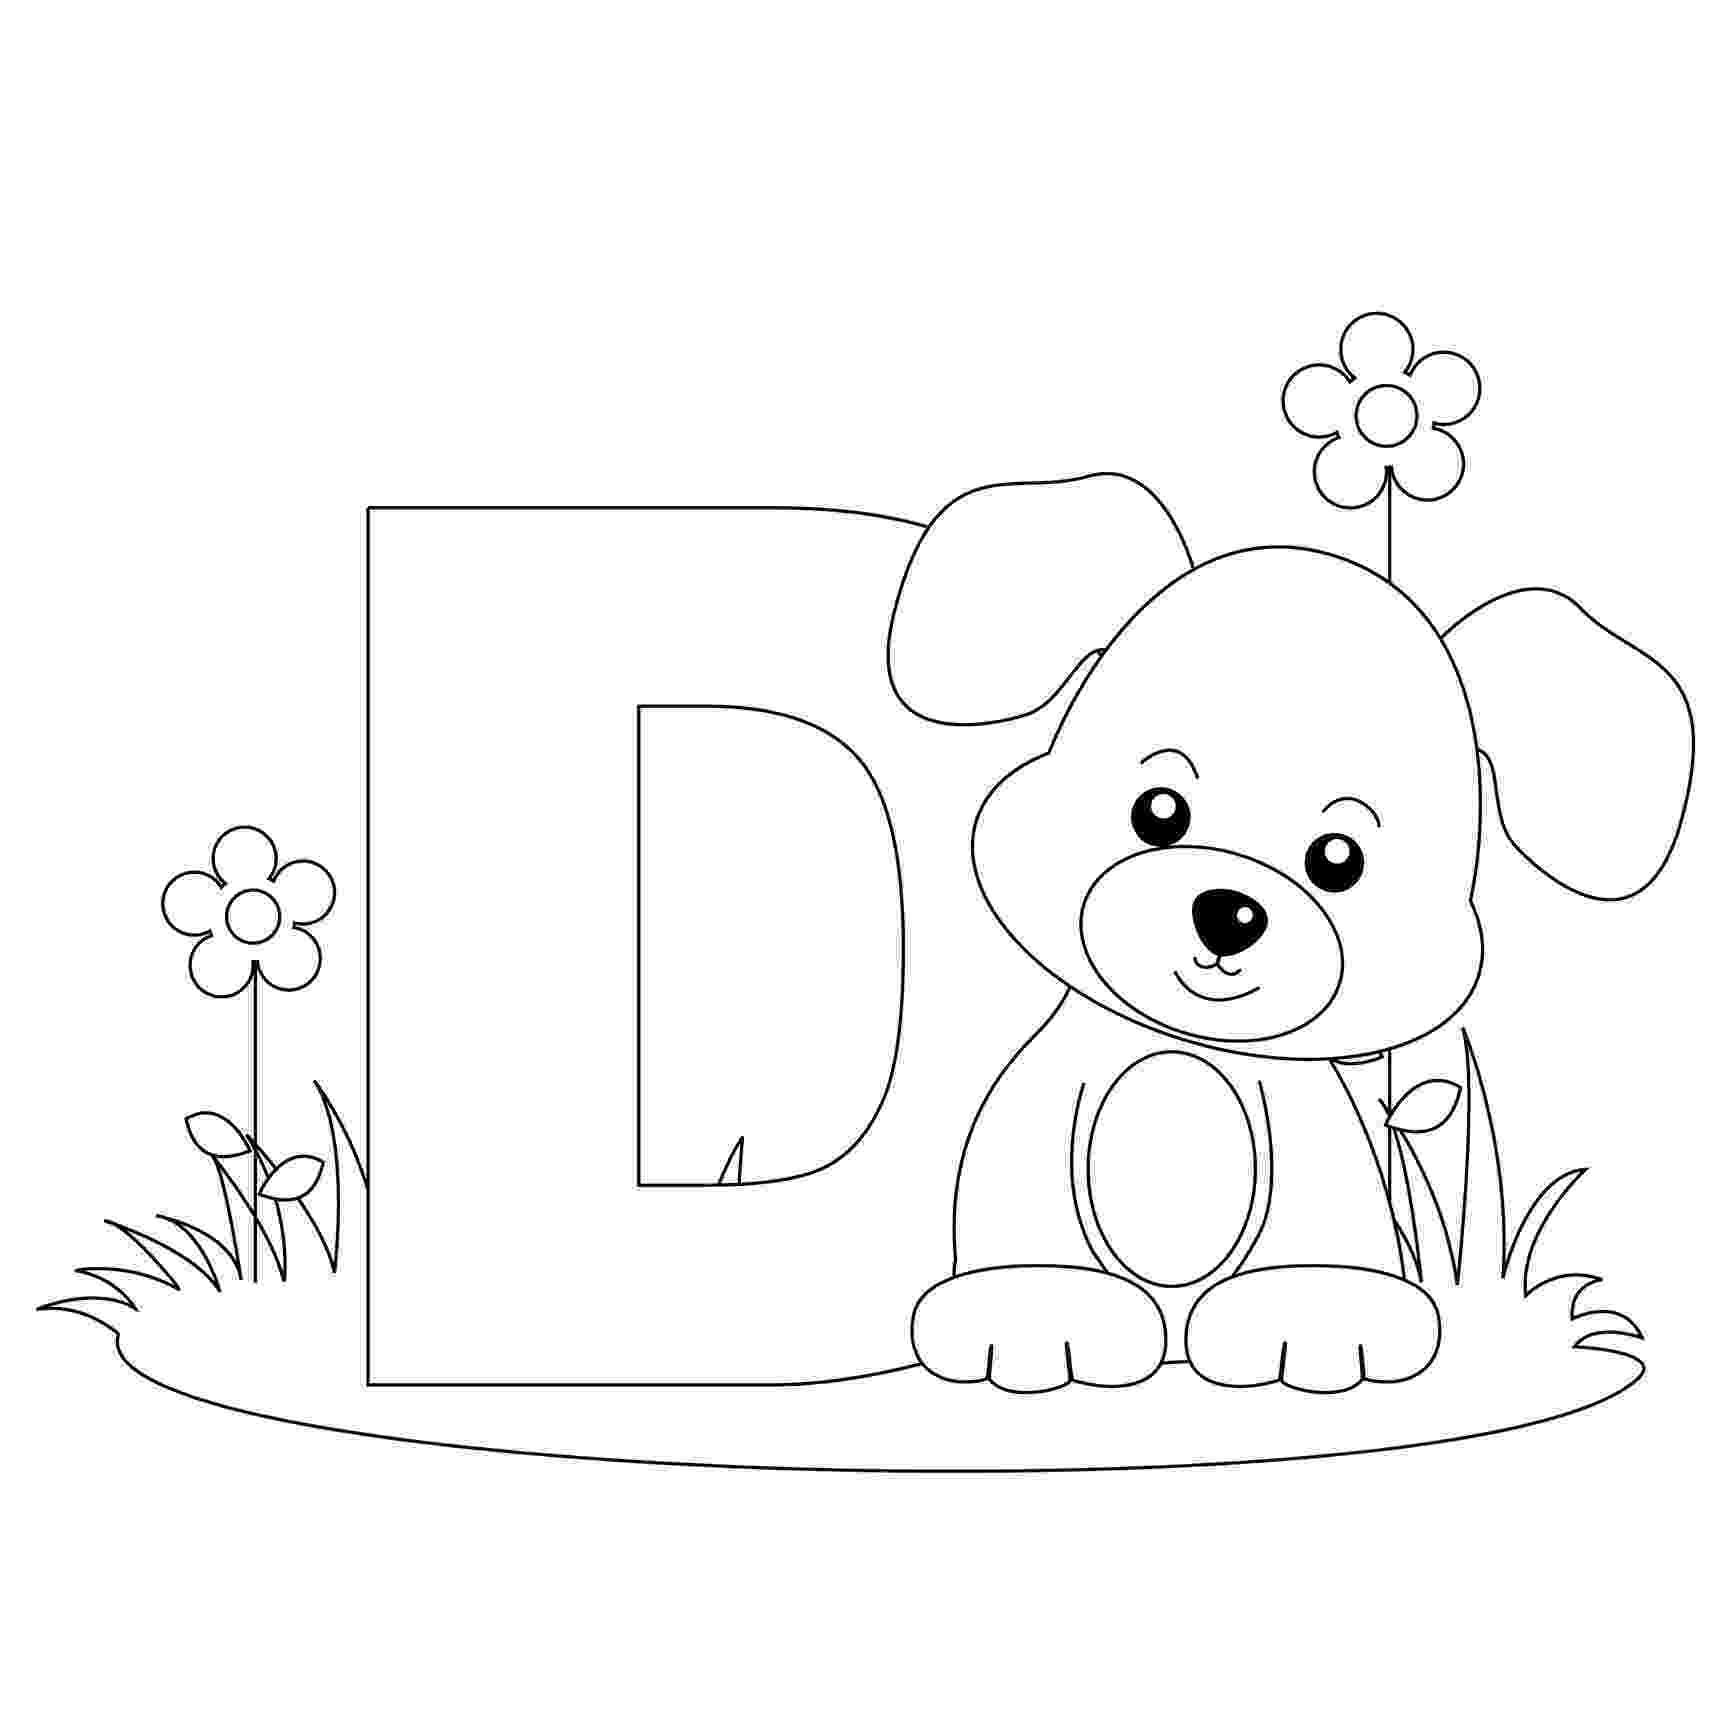 coloring animal alphabet free printable alphabet coloring pages for kids best coloring alphabet animal 1 3